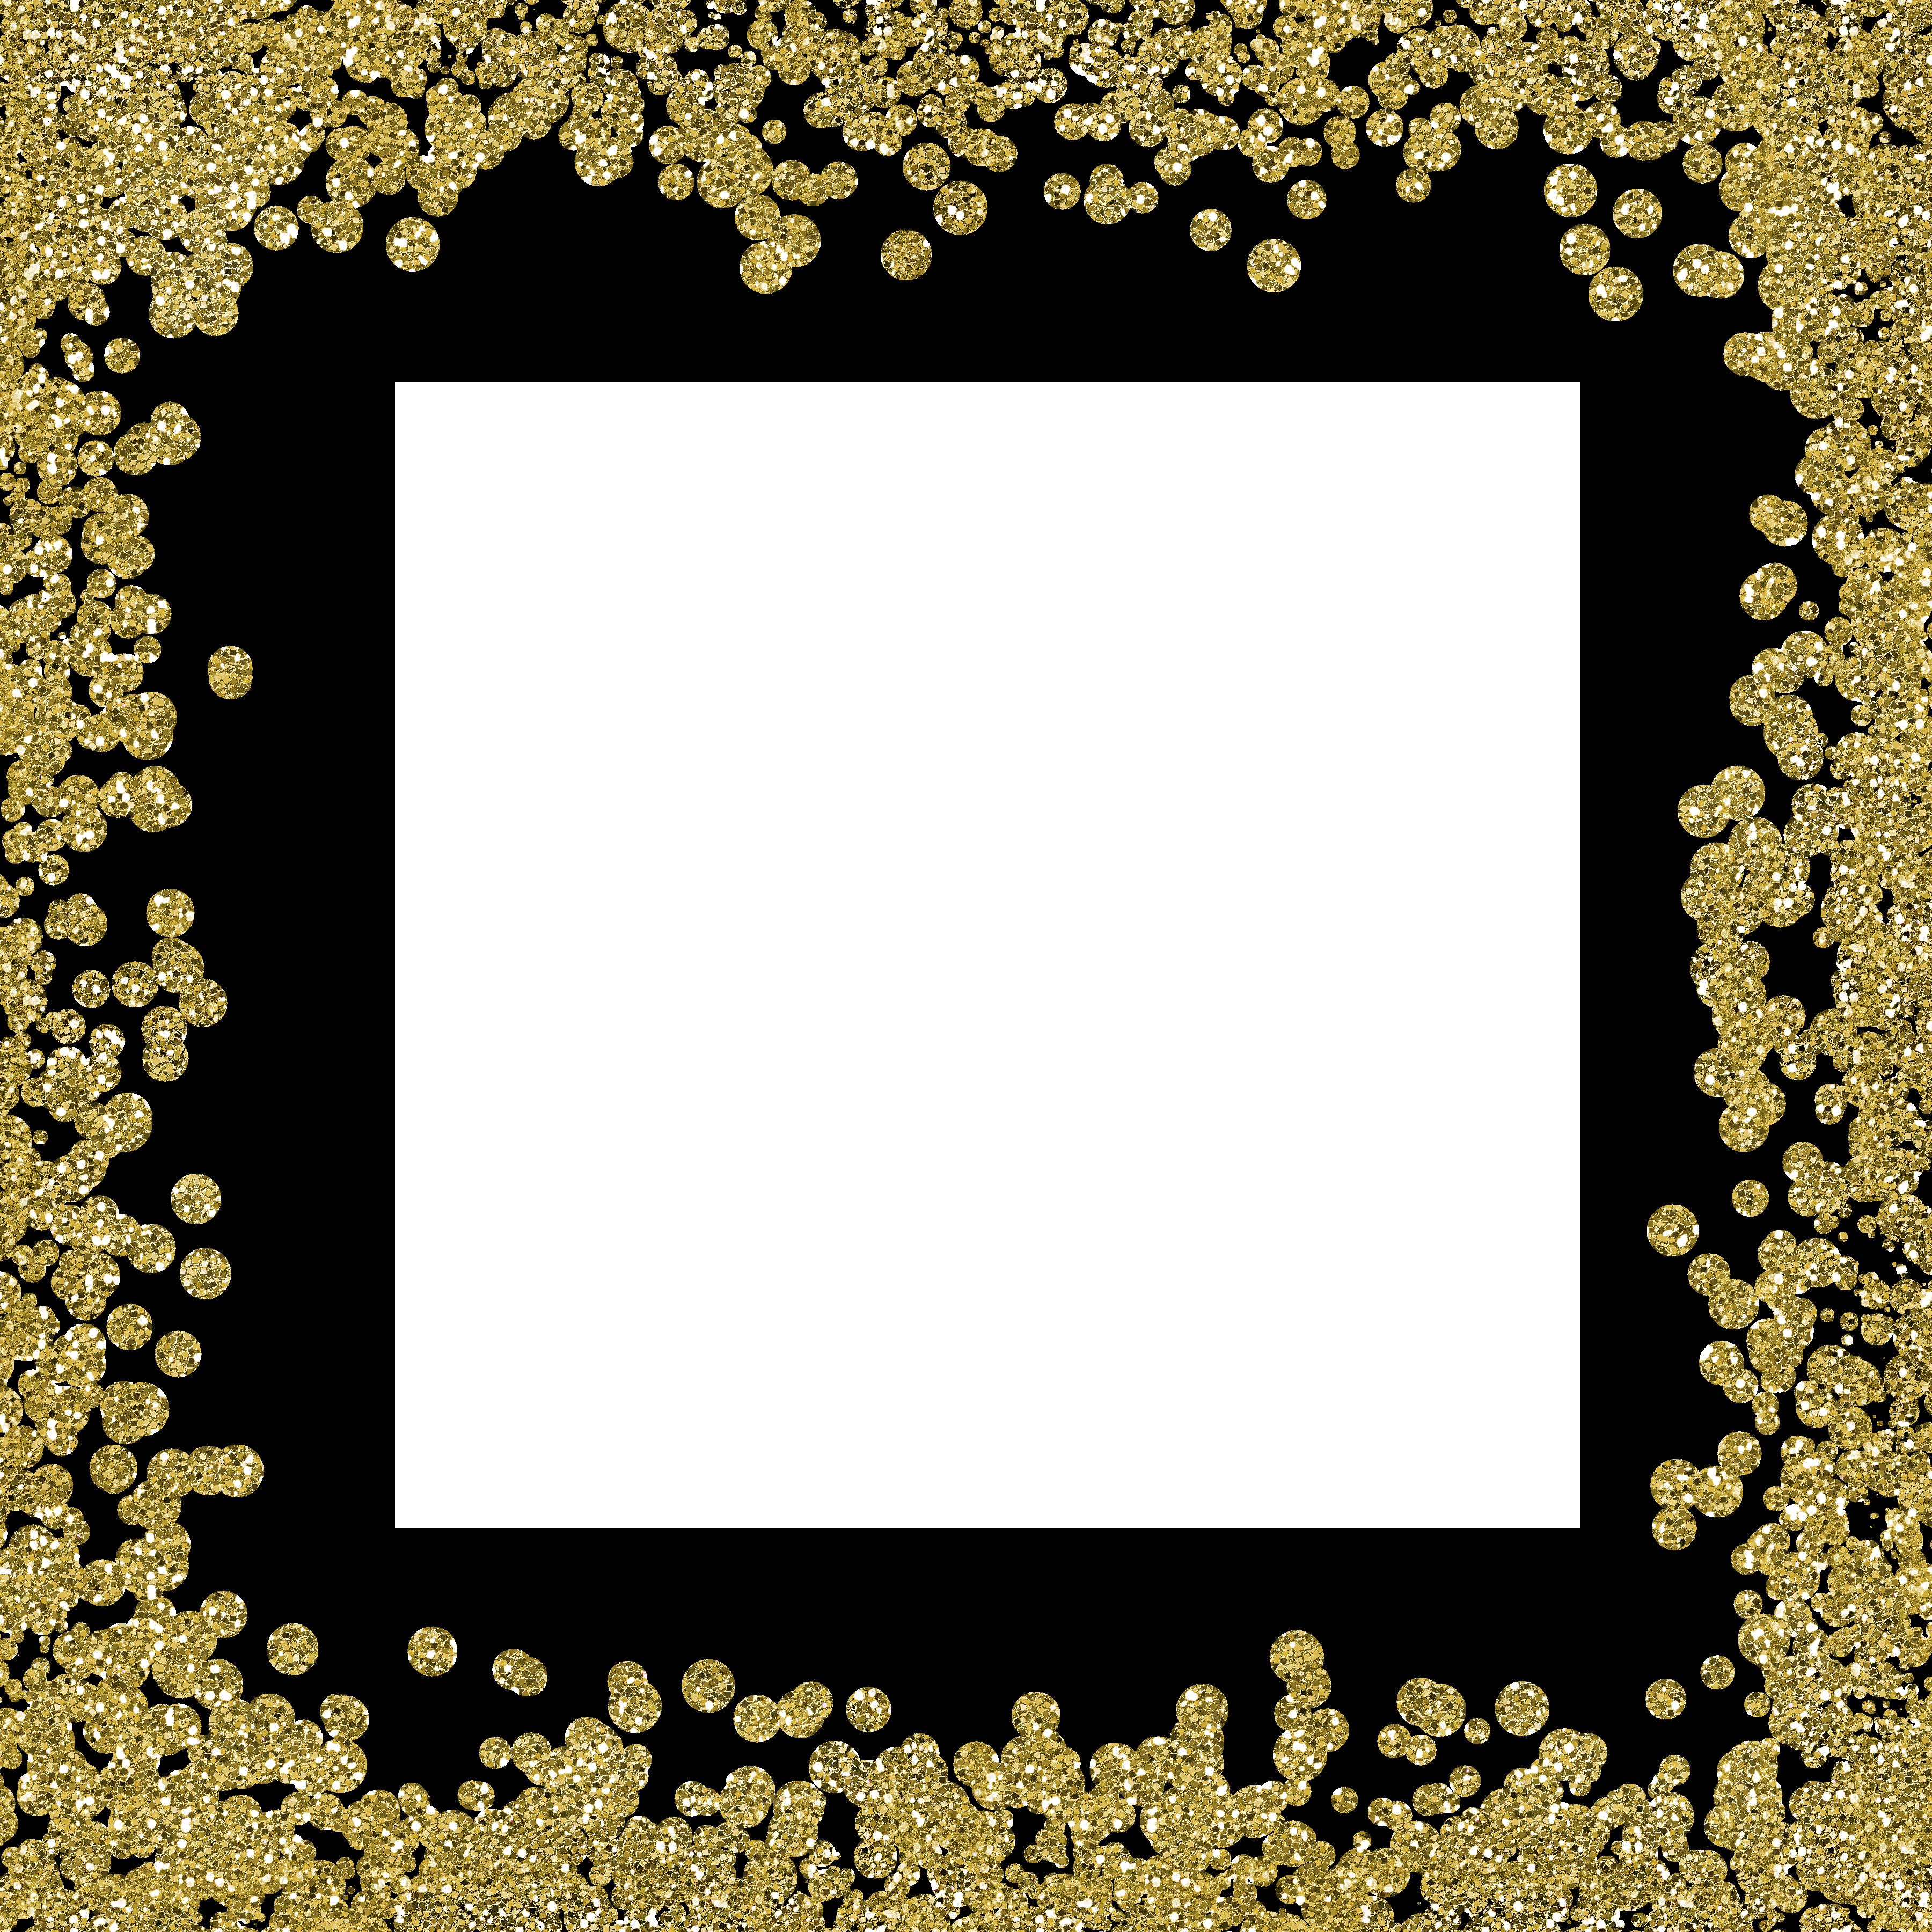 Glitter border png. Wedding invitation gold clip